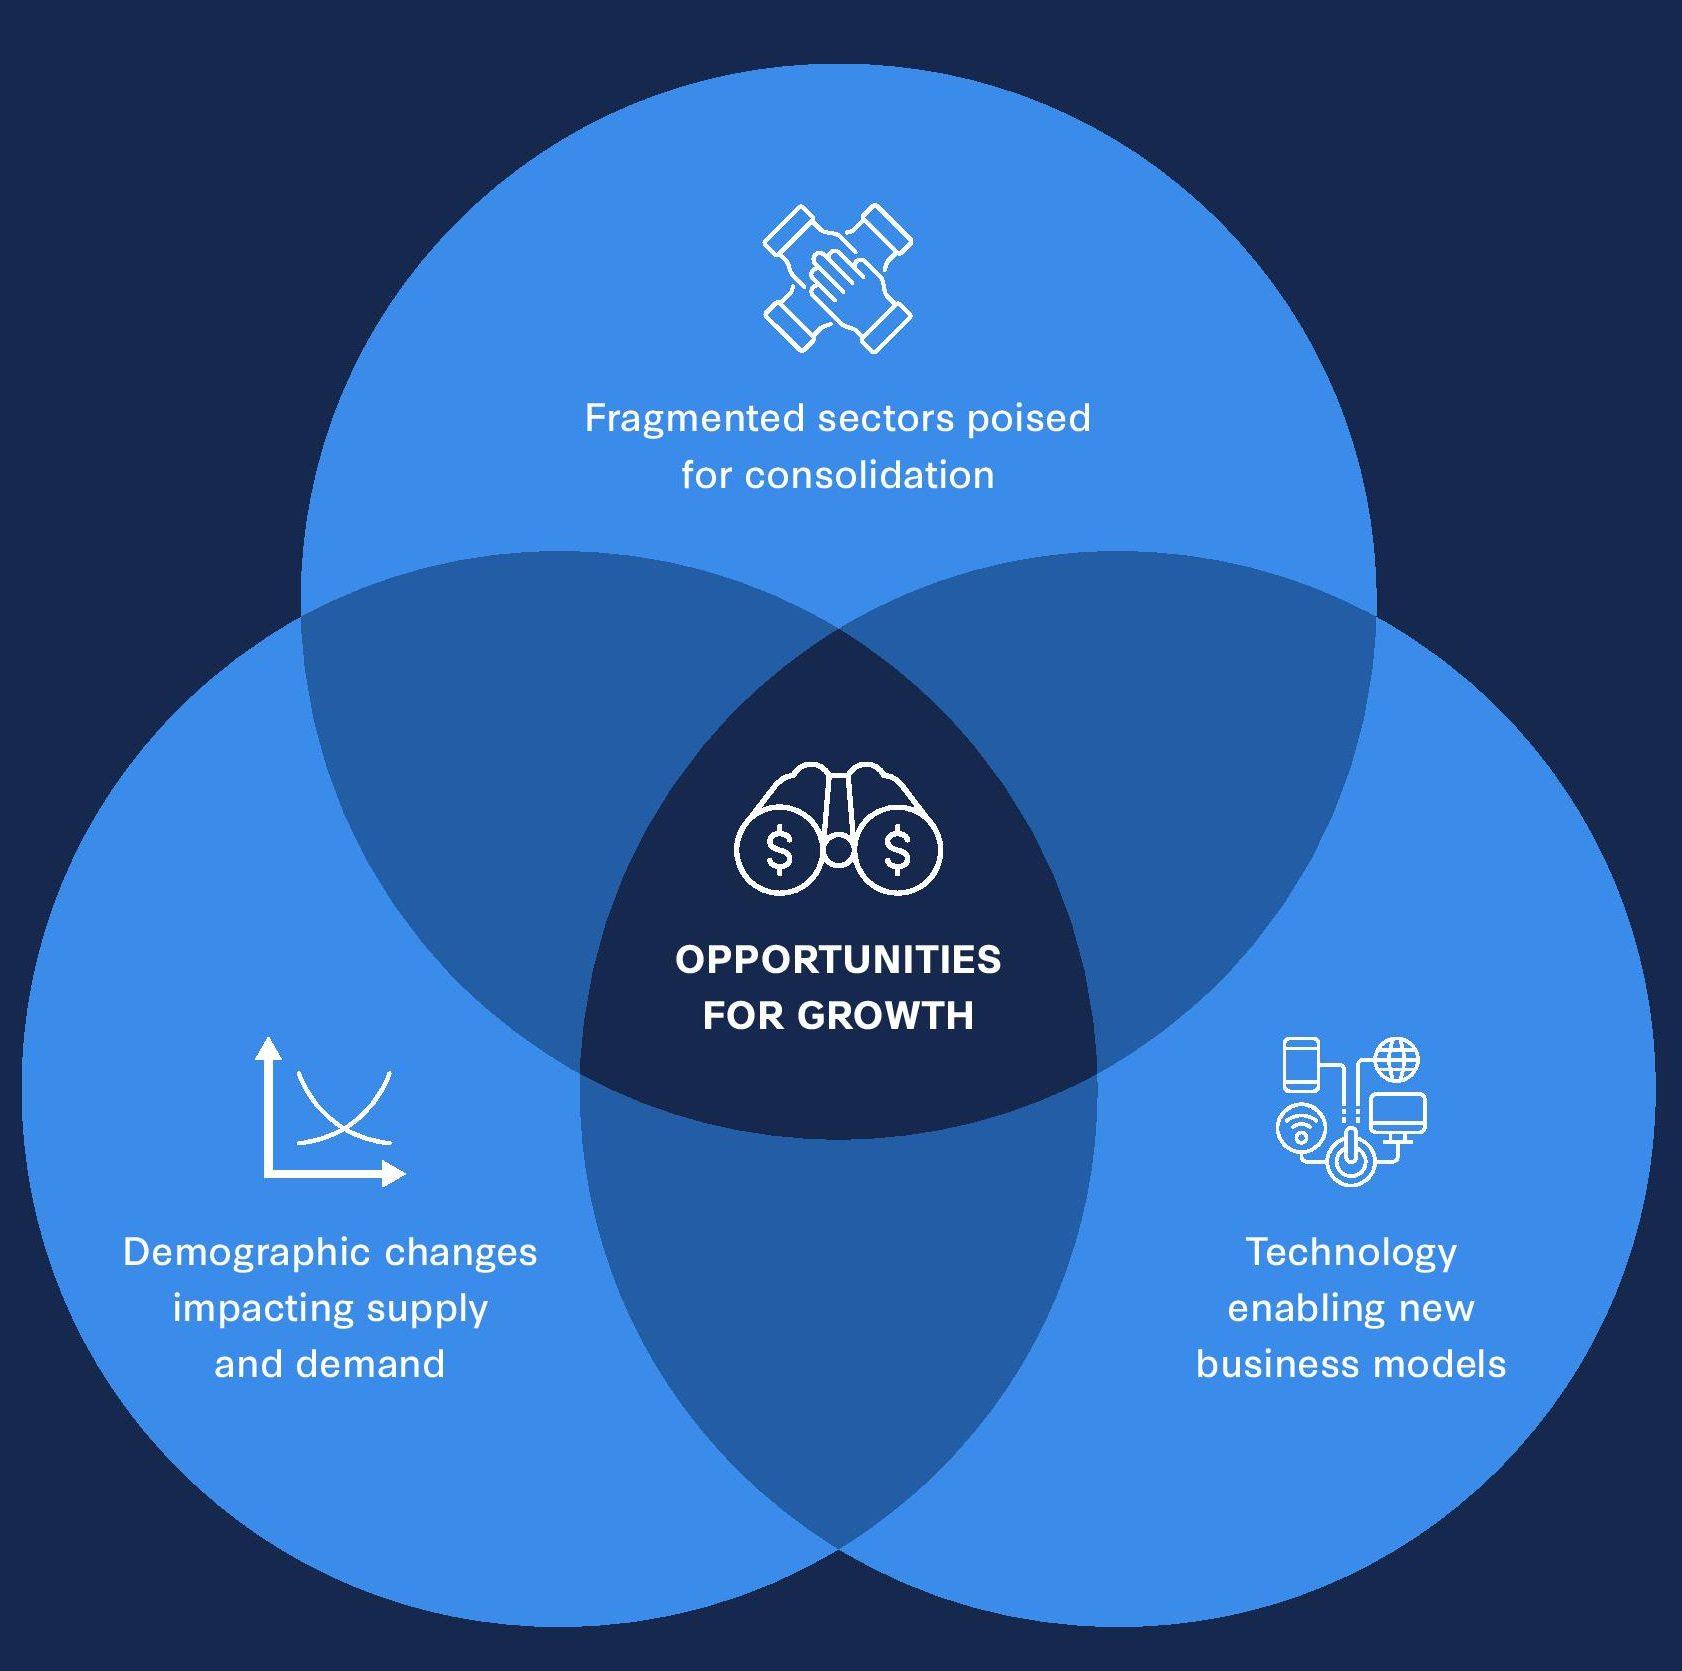 Growth catalysts diagram